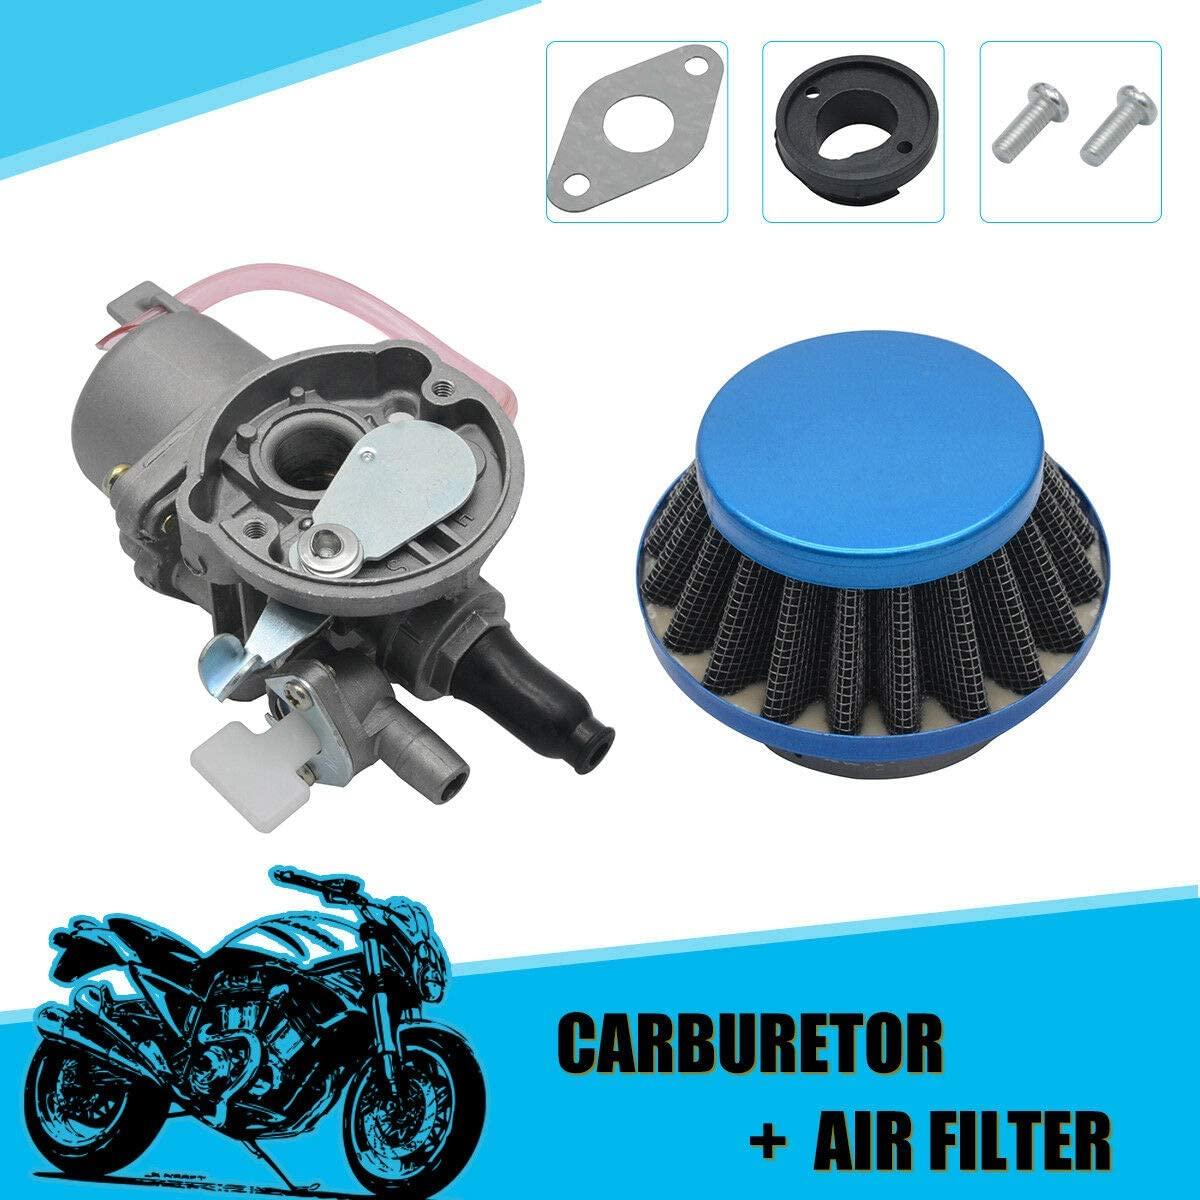 MASO Carburetor Carb + Air Filter 47cc 49cc Mini Motor ATV Quad Dirt Pocket Bike (Bule)